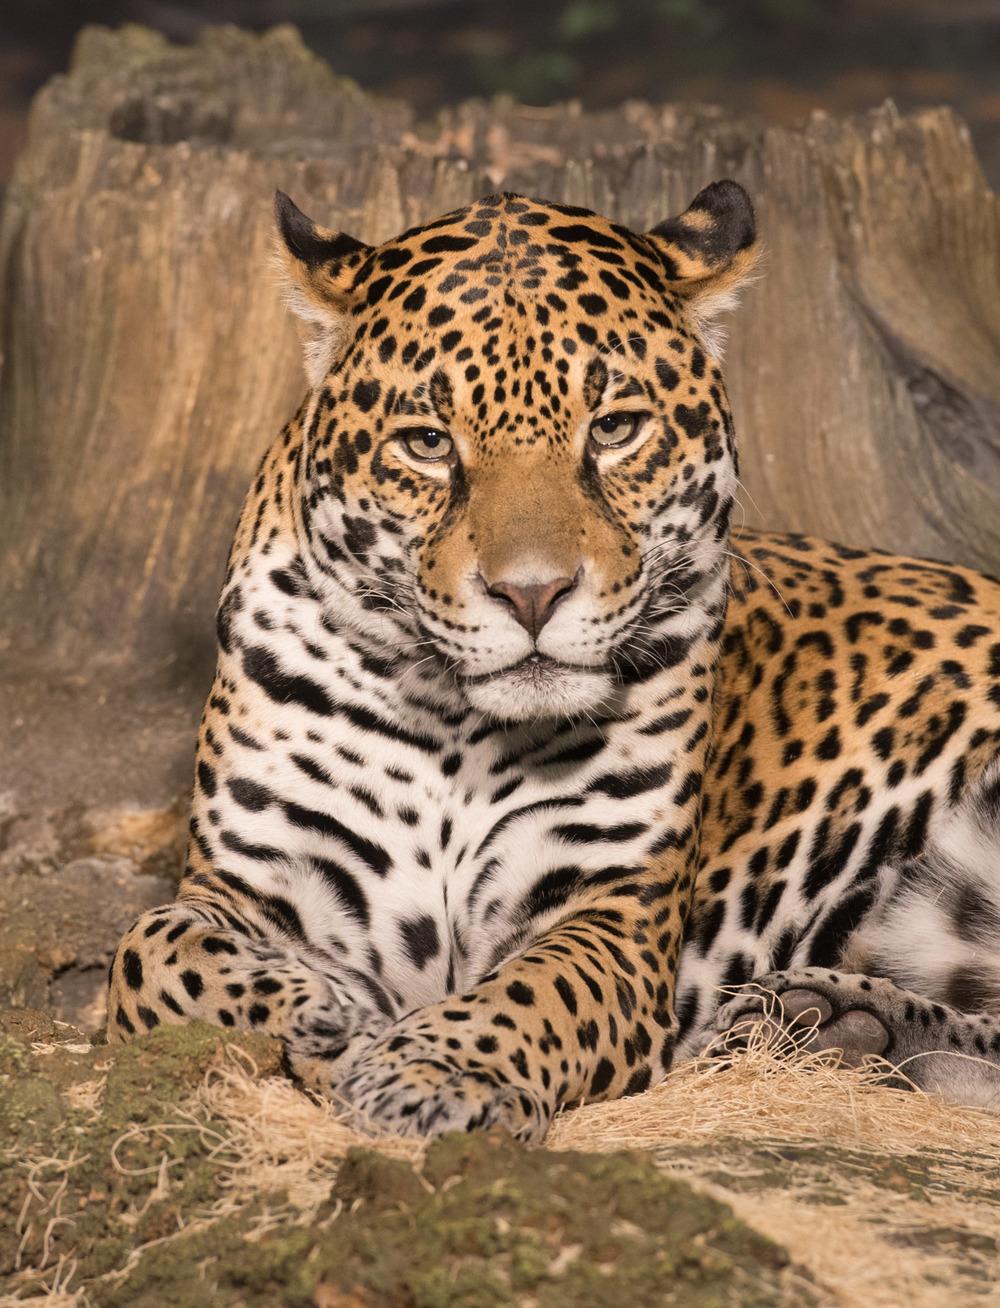 zoo-024.jpg